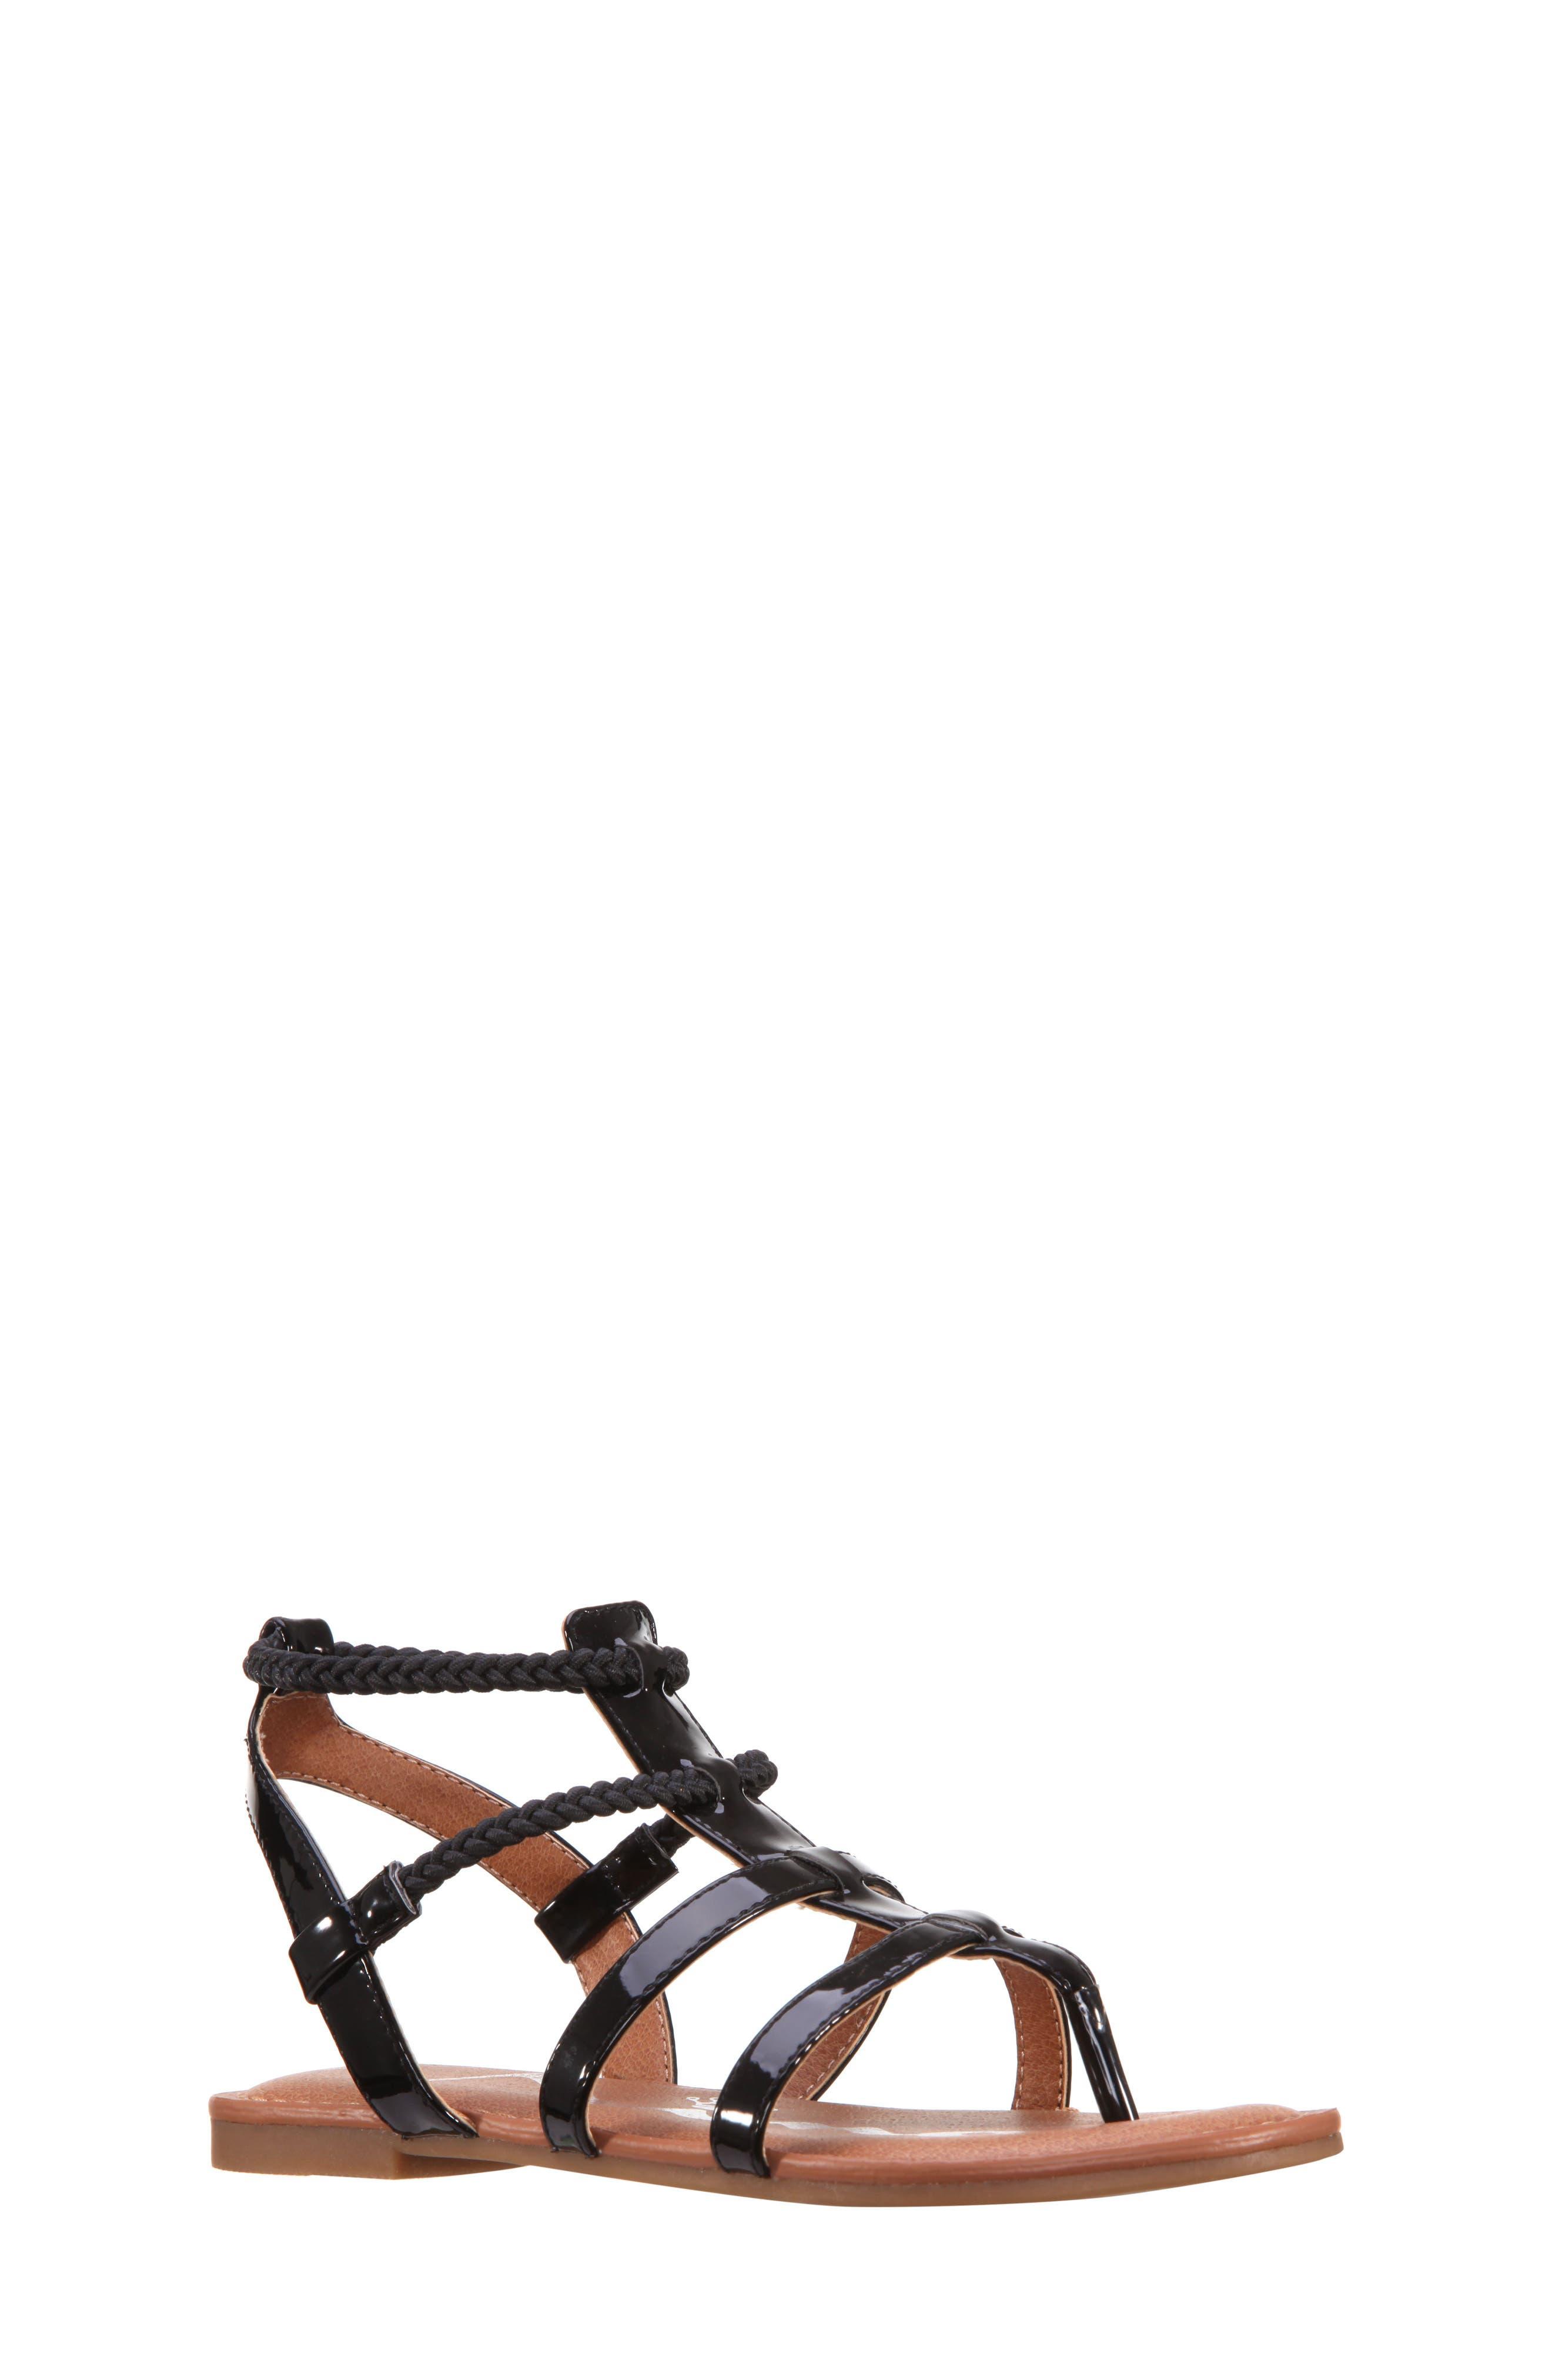 Margaree Gladiator Thong Sandal,                             Main thumbnail 1, color,                             Black Patent